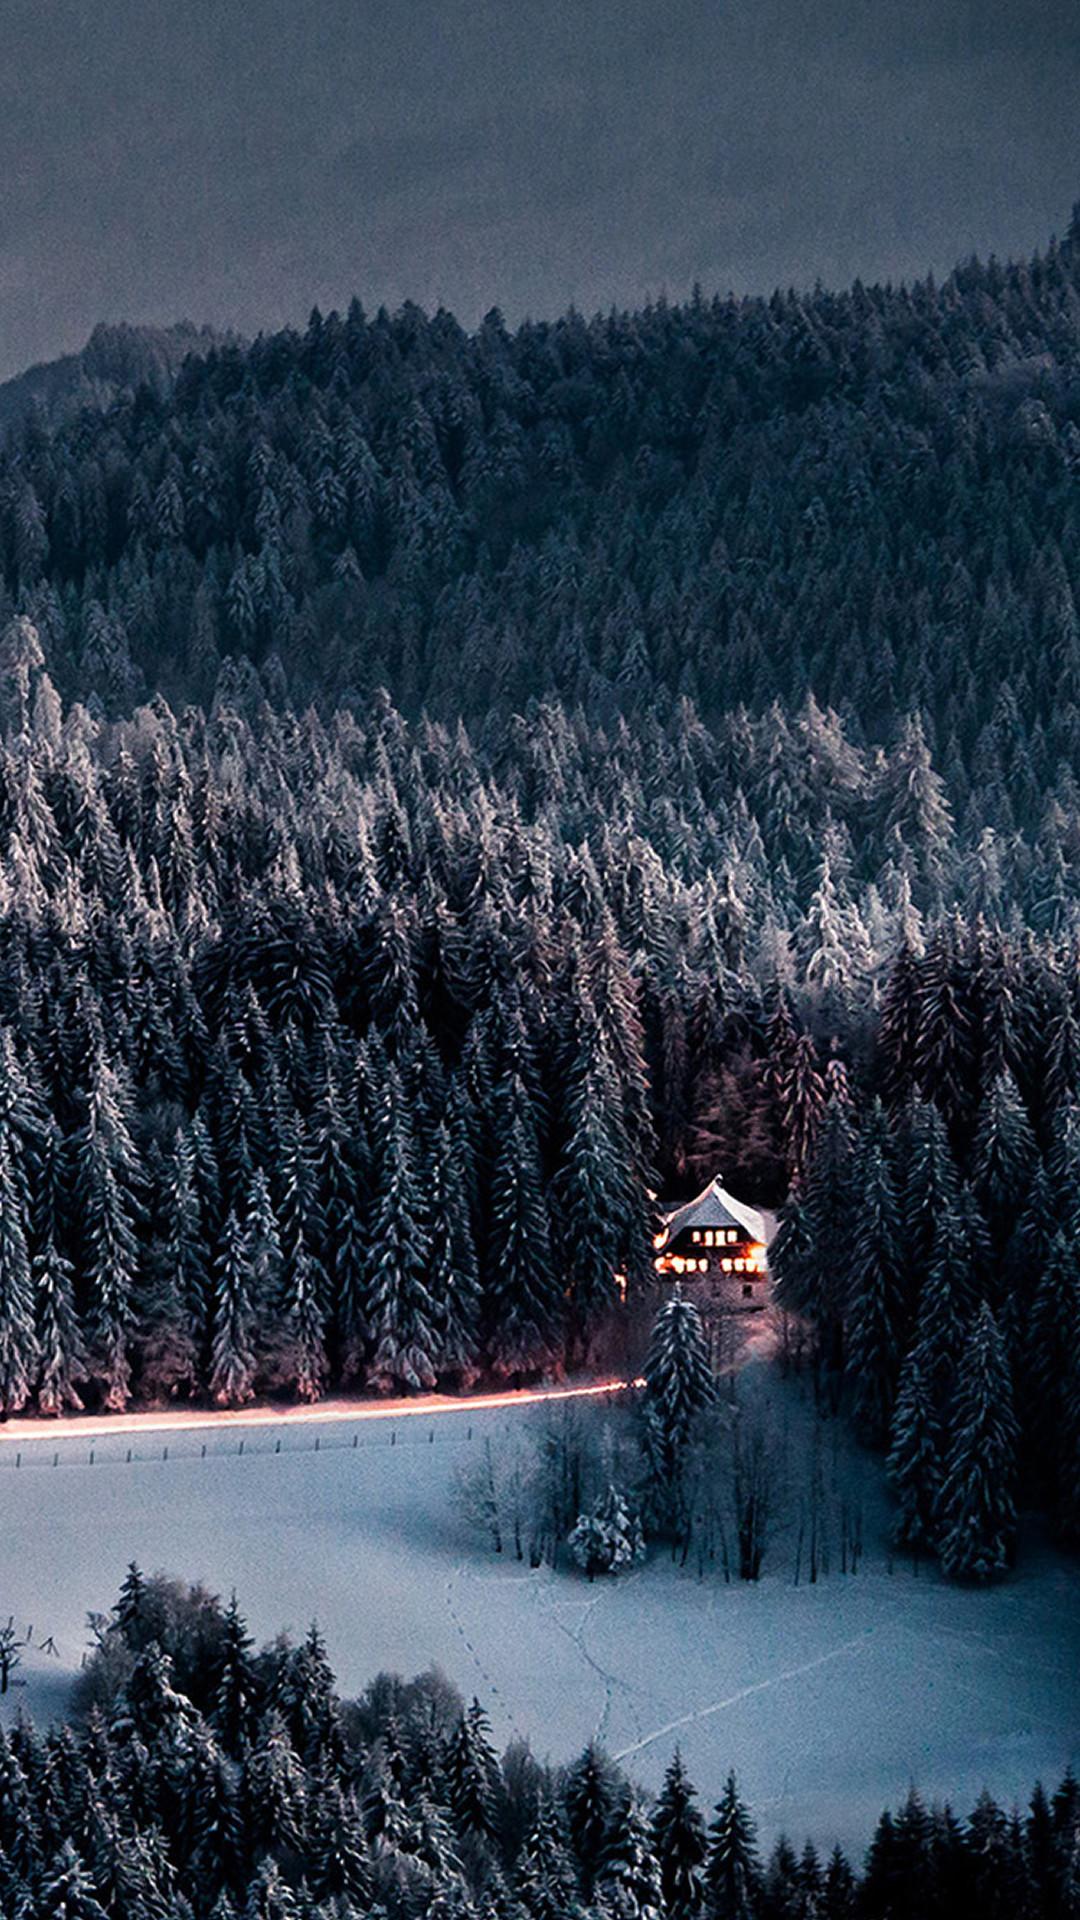 Winter Snow Forest Chalet Retreat iPhone 8 wallpaper